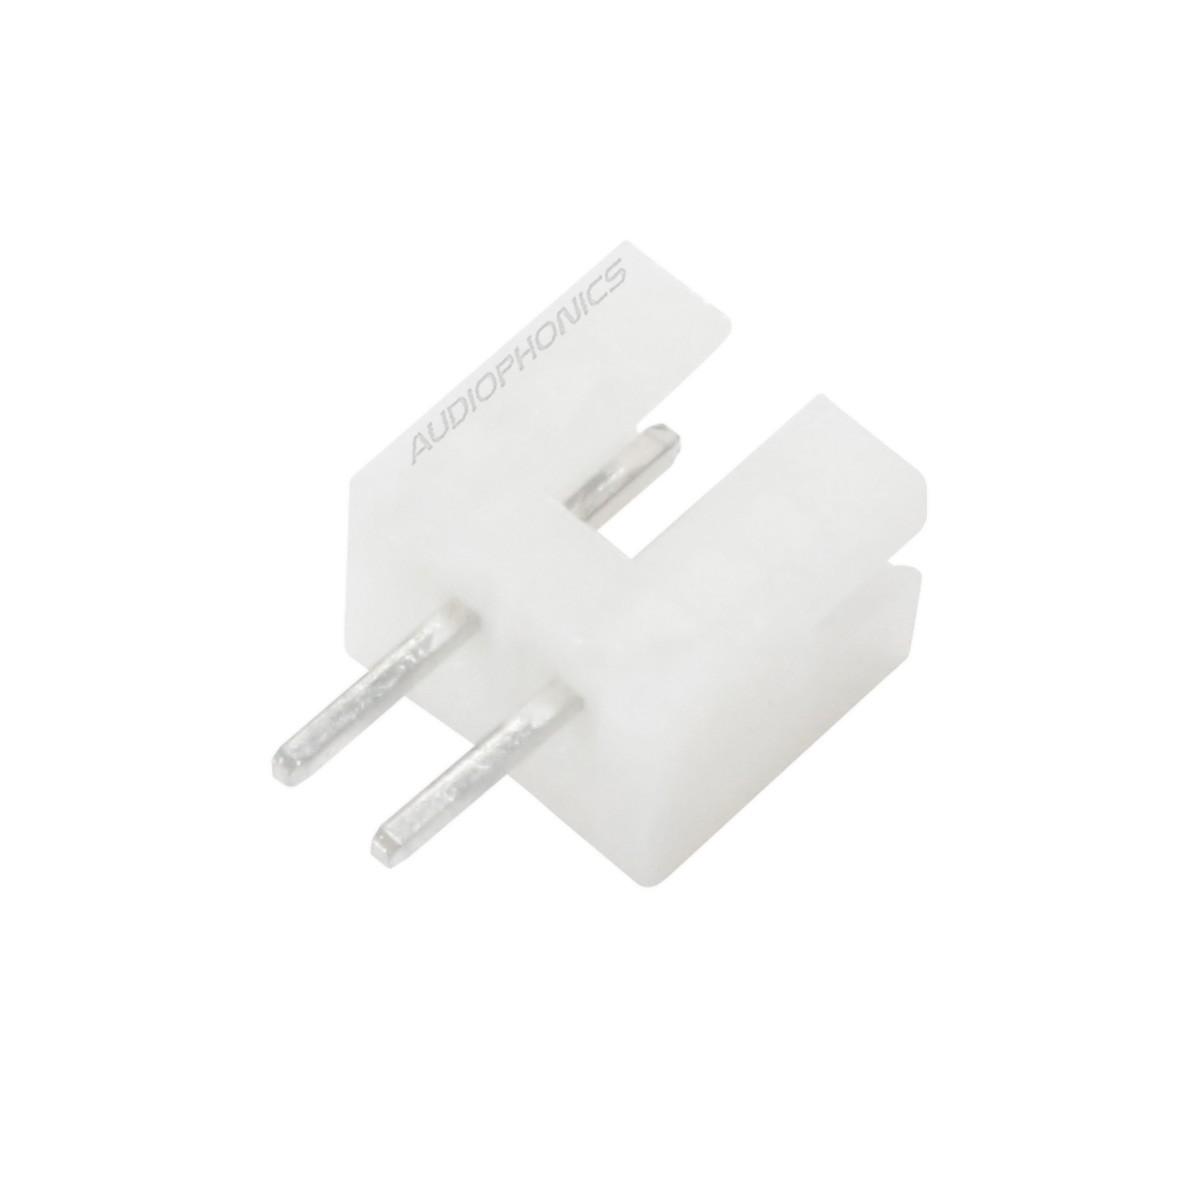 PH 2.0mm Male Socket 2 Channels White (Unit)